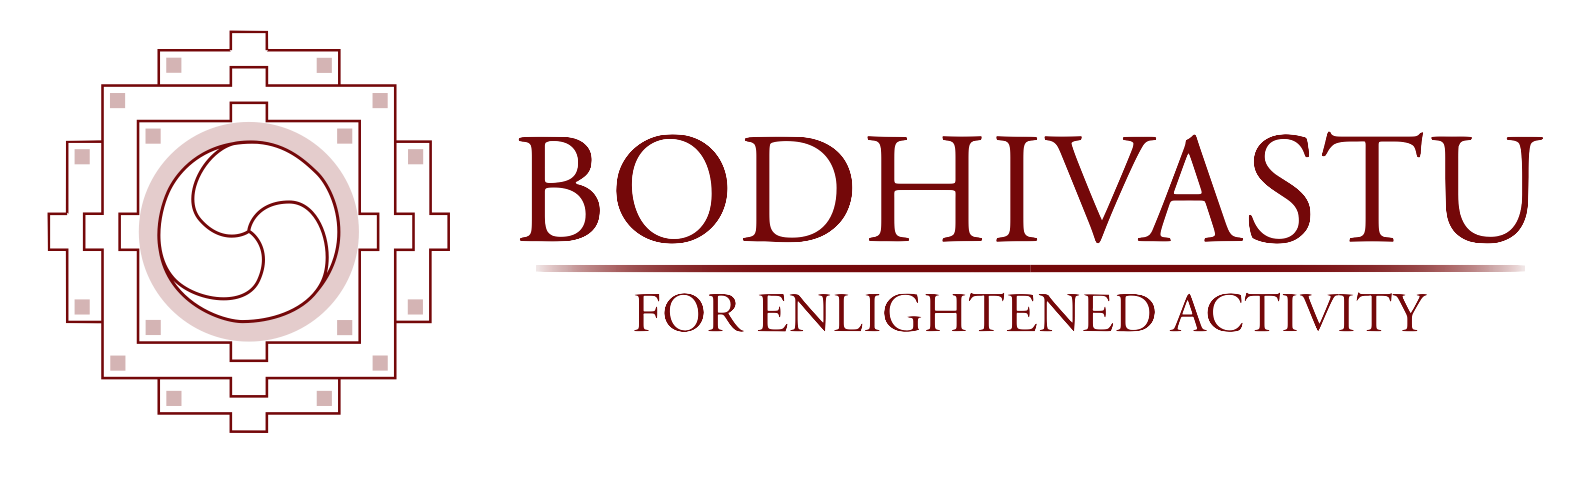 BODHIVASTU LOGO ALLIANCE.png